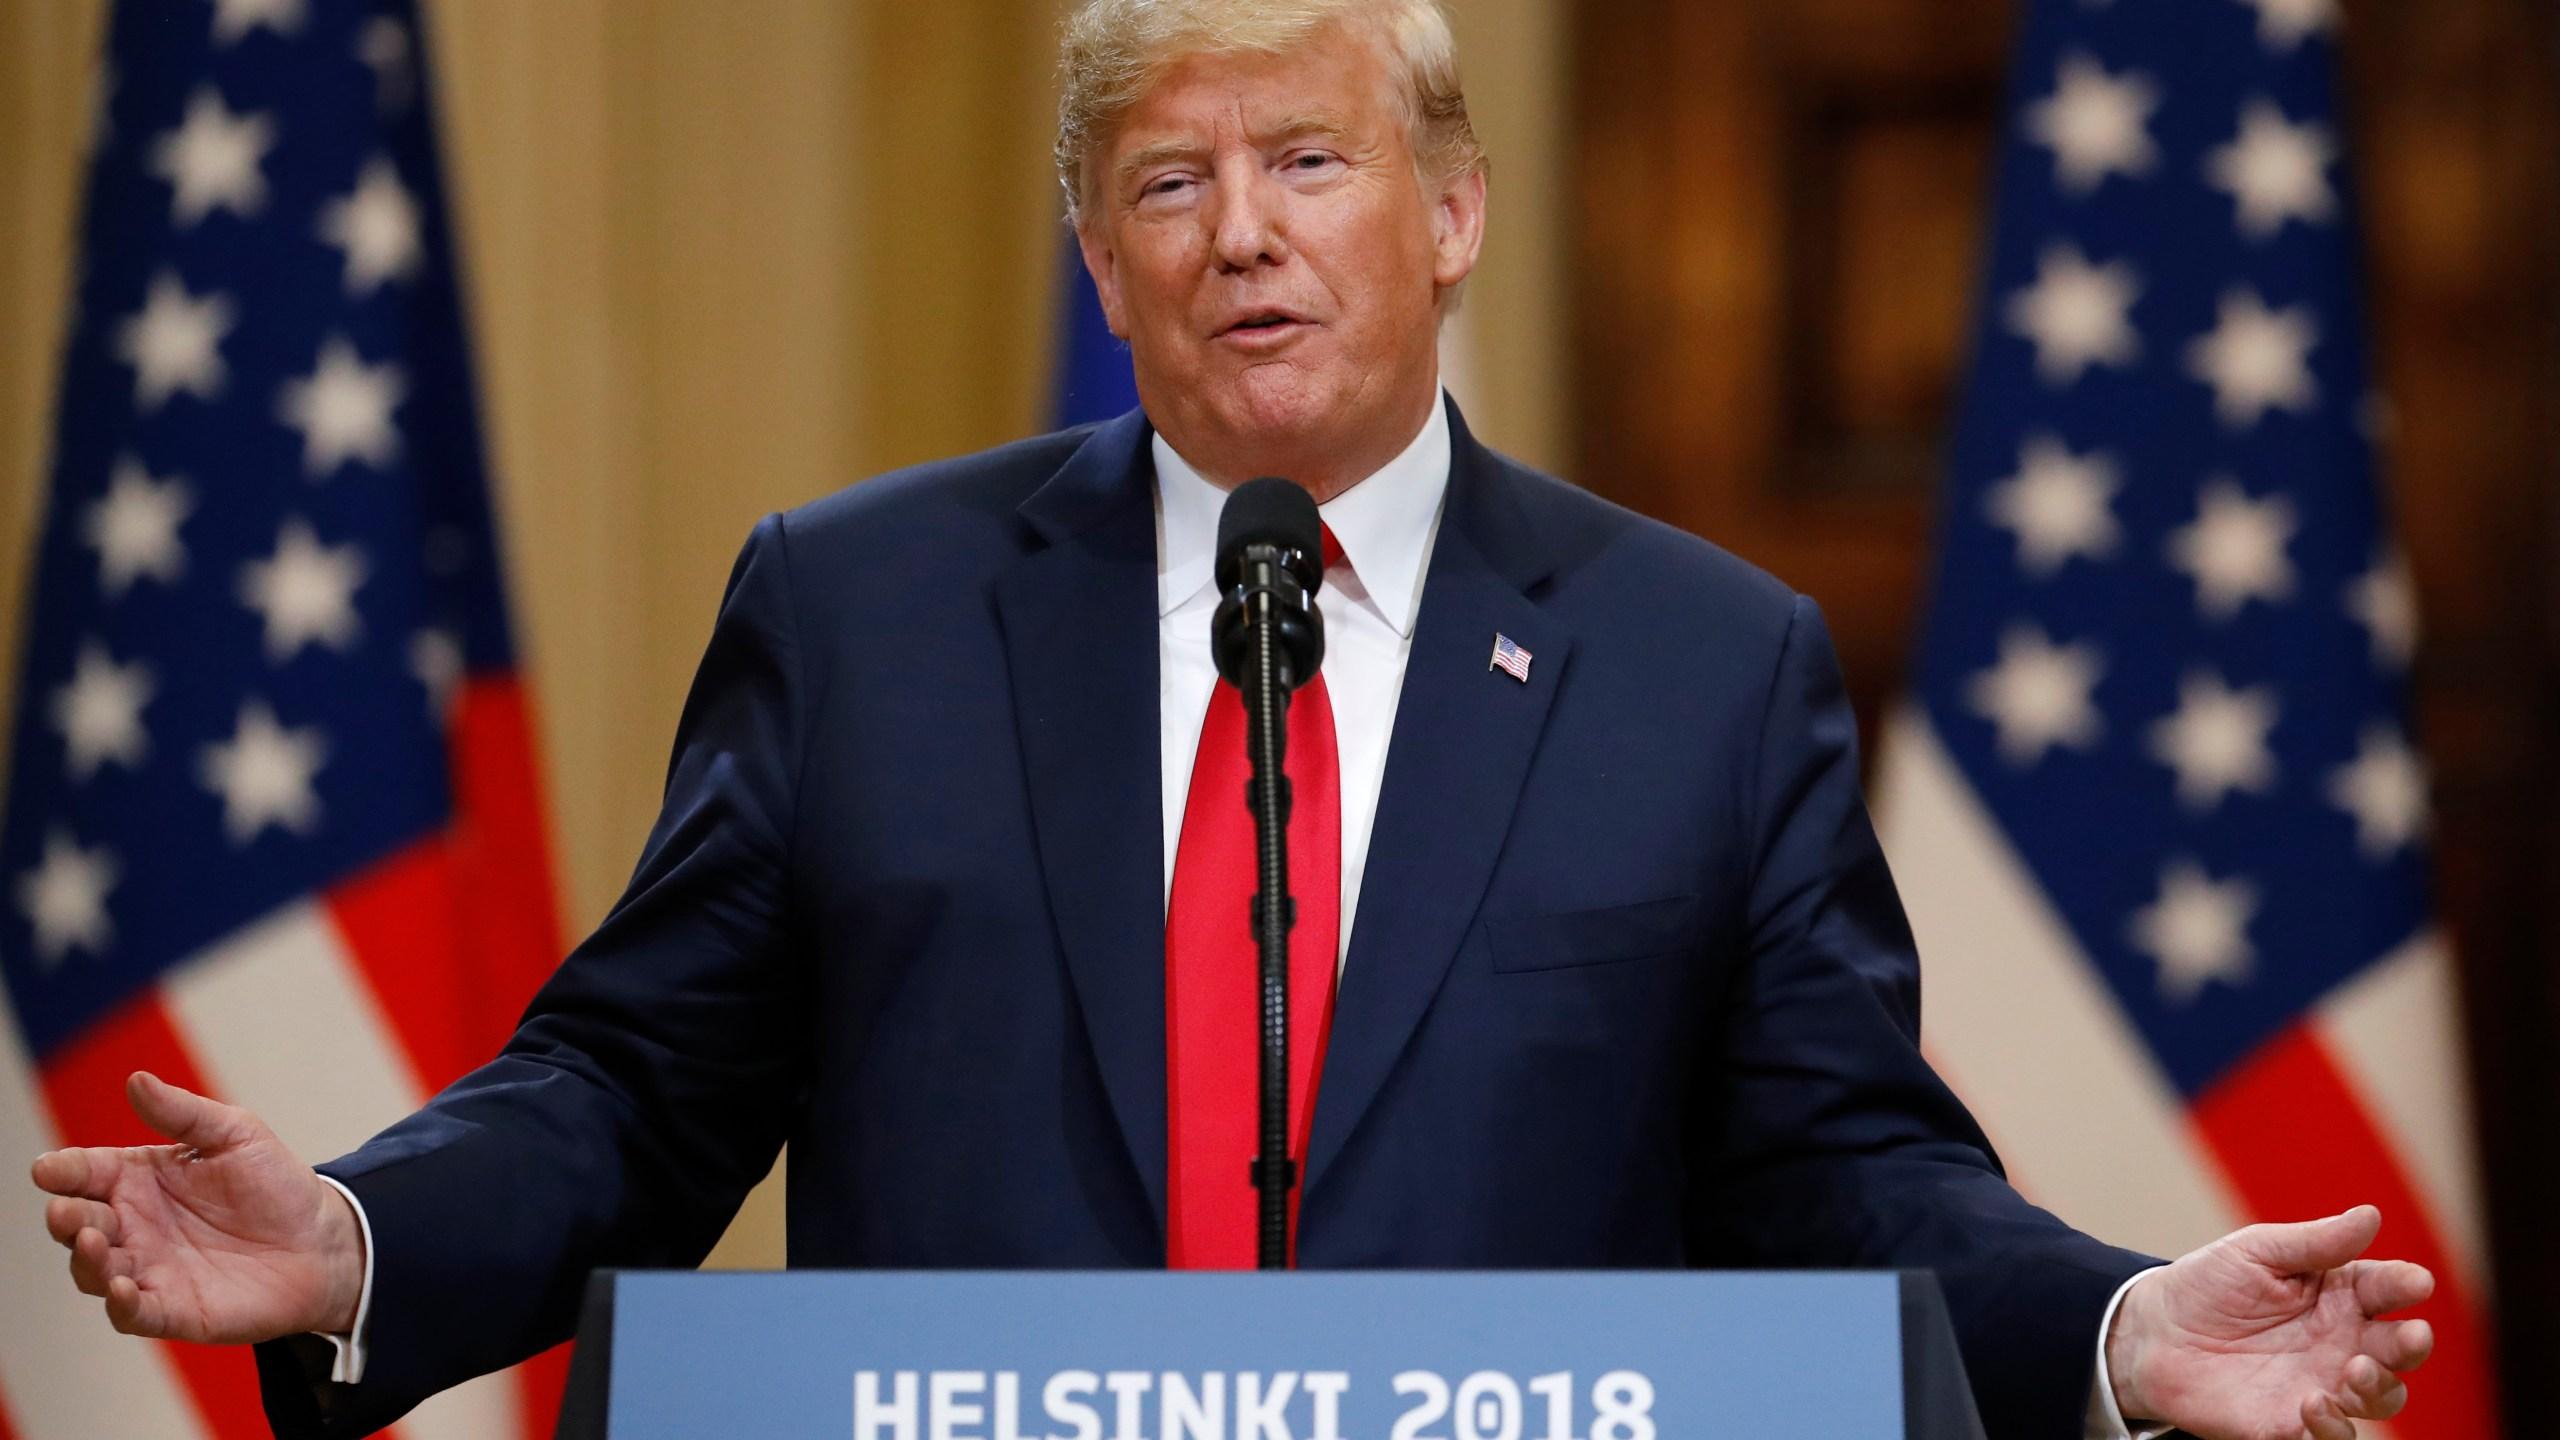 Finland_Trump_Putin_Summit_77721-159532.jpg67106510